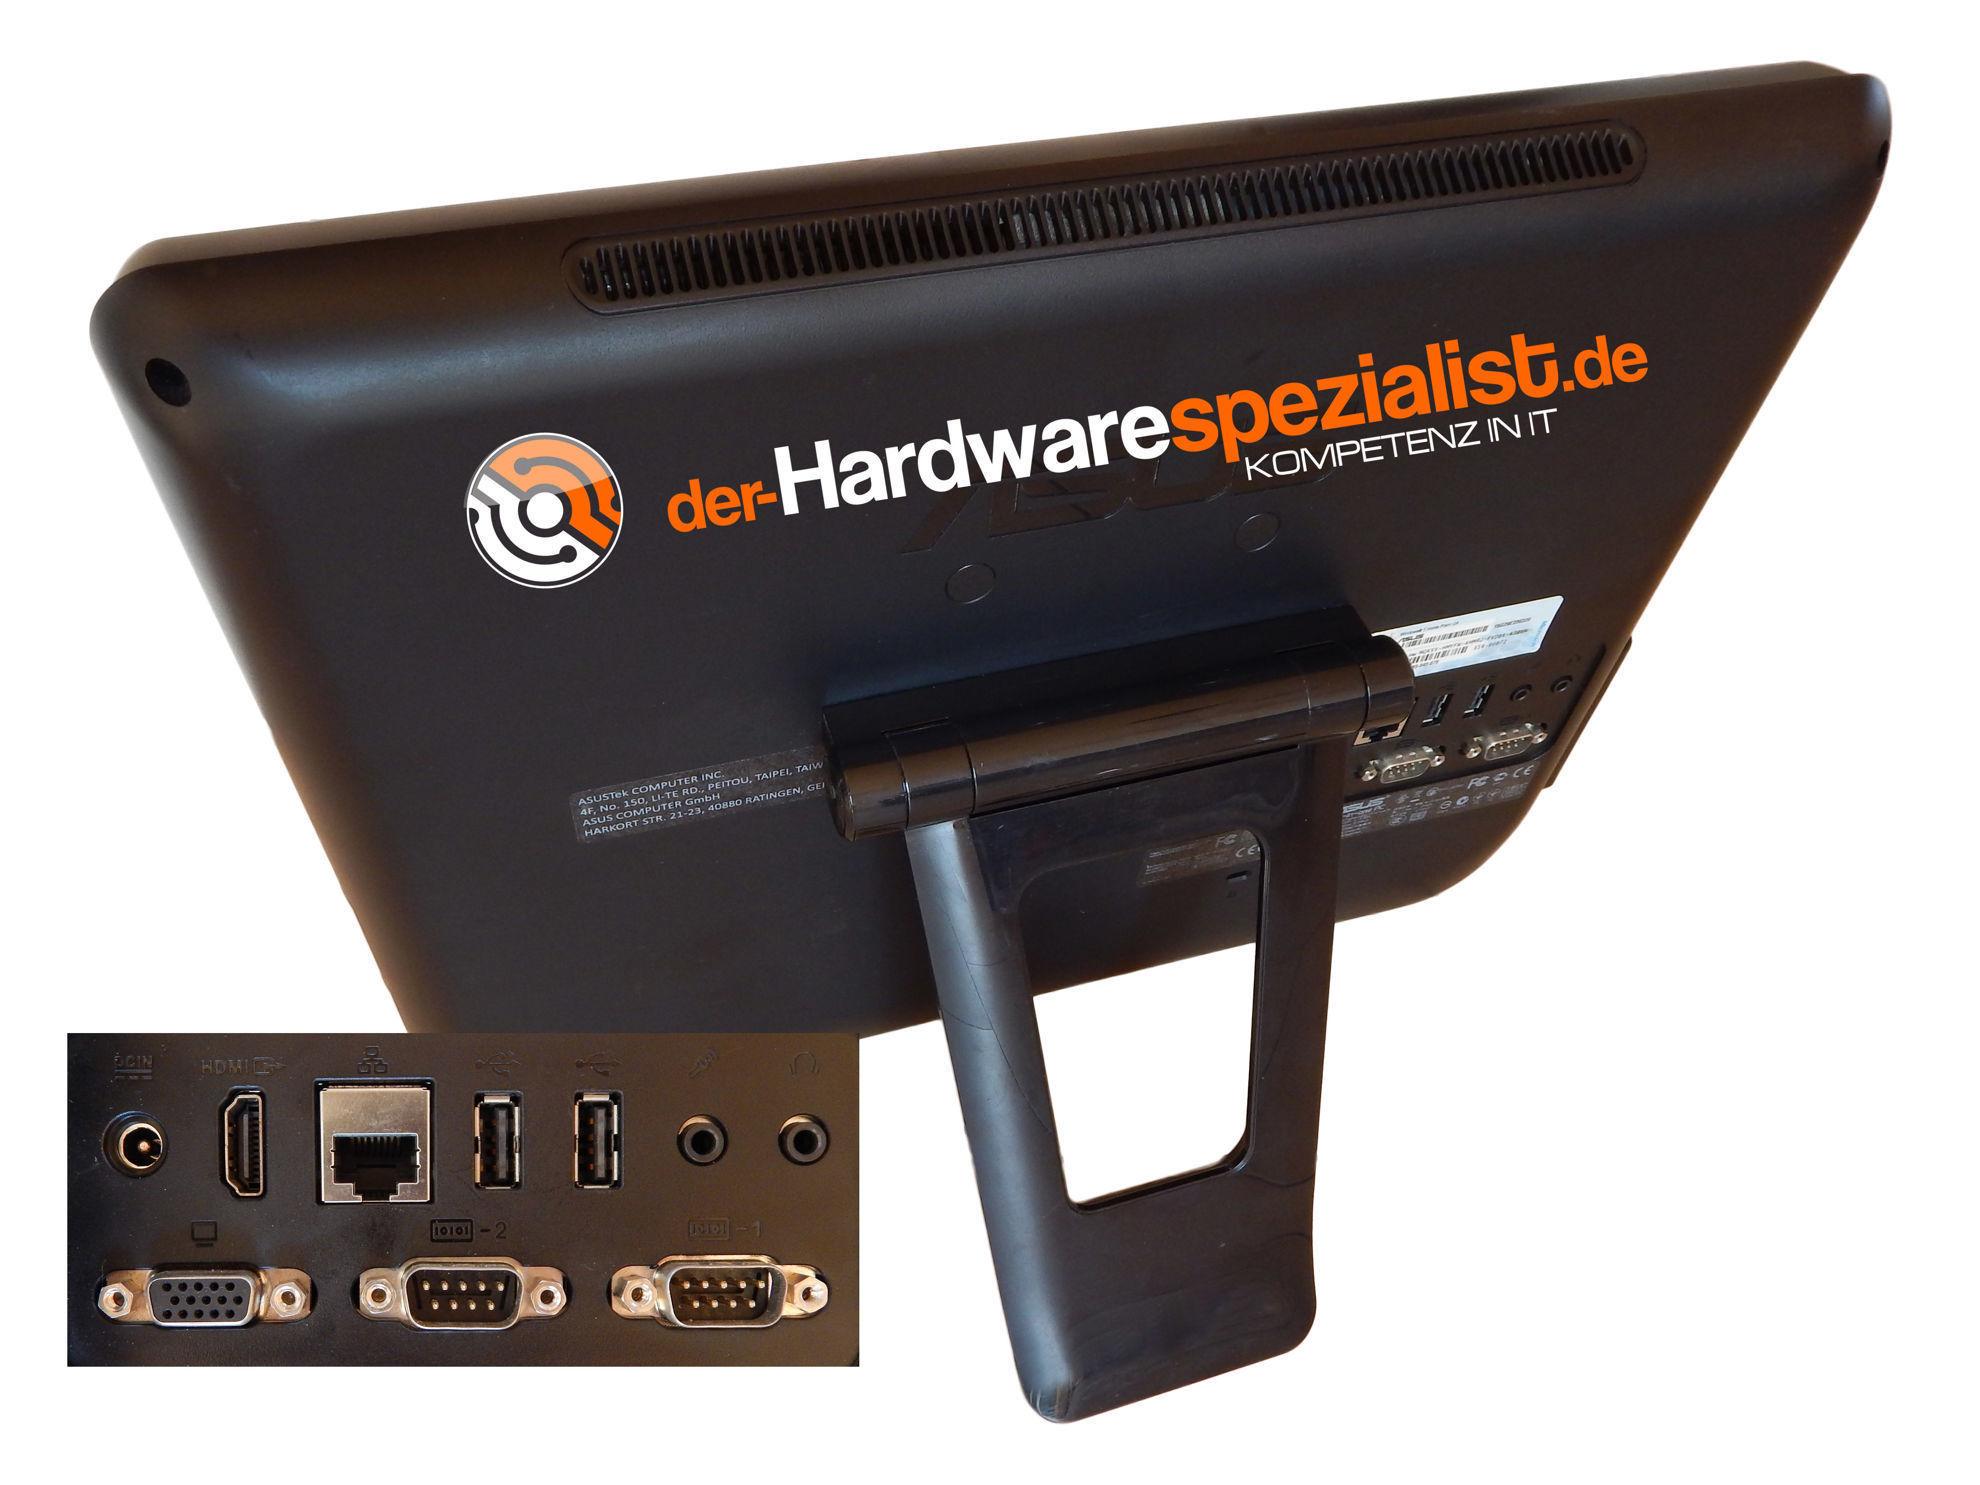 Bild von Asus EeeTop ET1612IUTS (WIN10 US+SSD) All in One PC POS TouchComputer Kassensystem (Generalüberholt)